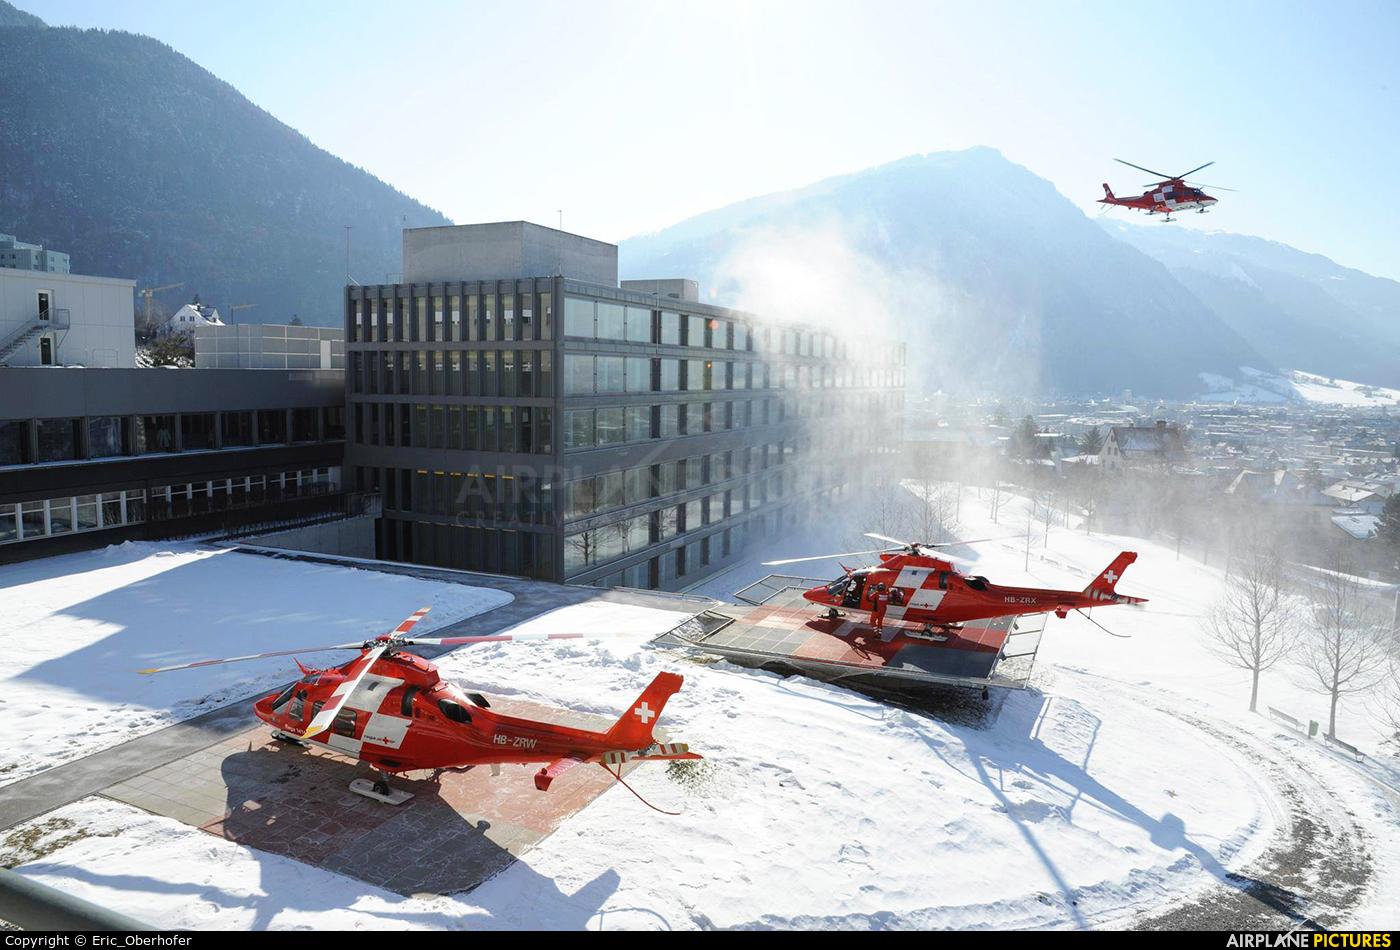 REGA Swiss Air Ambulance  HB-ZRW aircraft at Off Airport - Swiss Alps